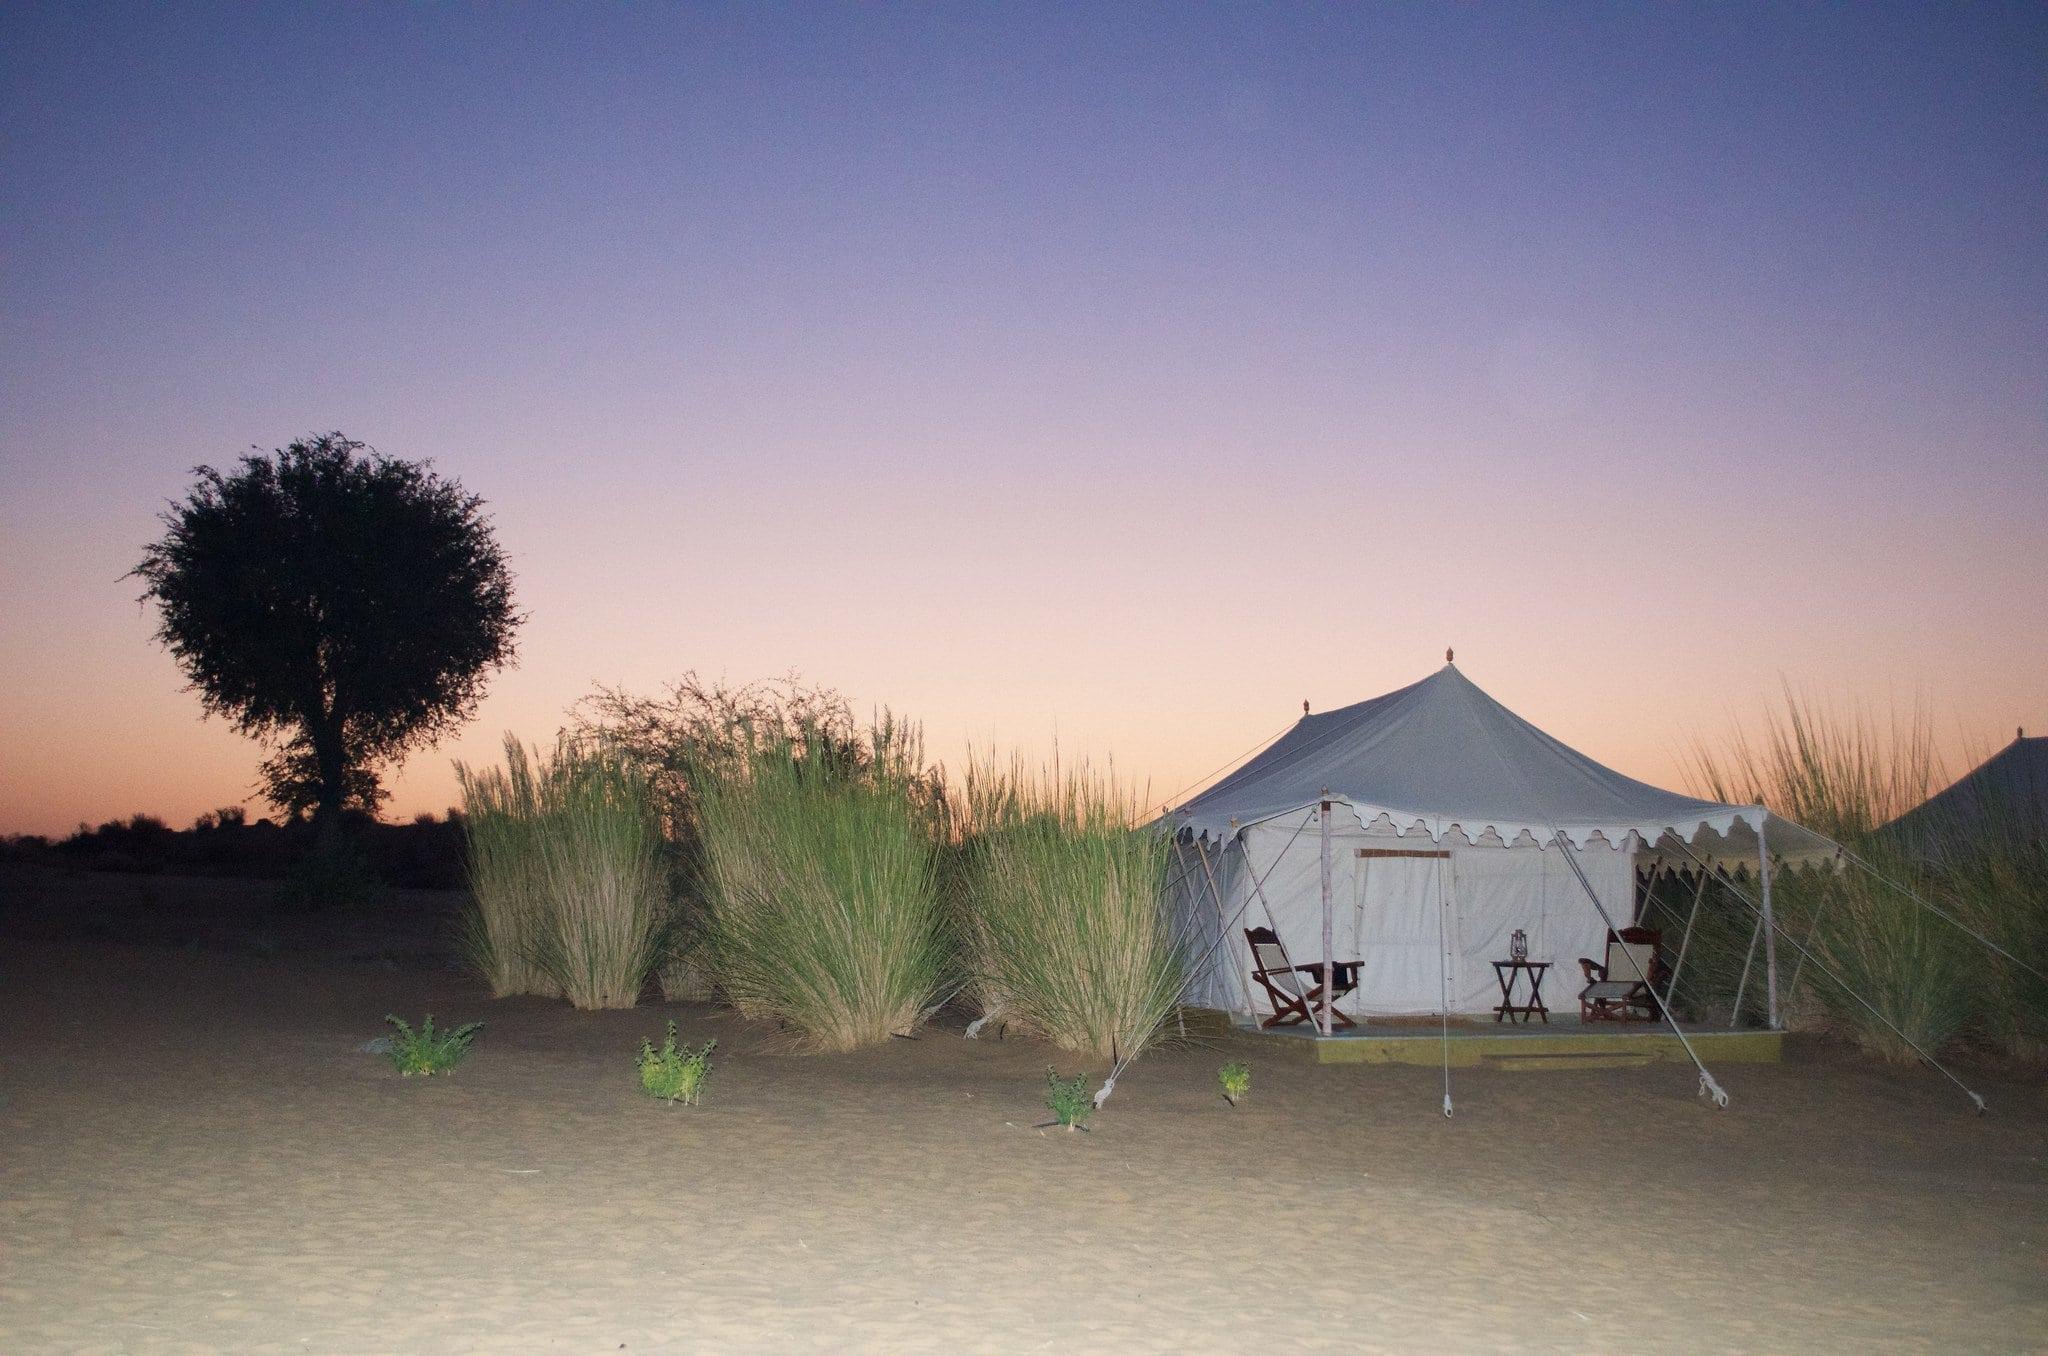 Sonnenaufgang im Manvar Desert Camp